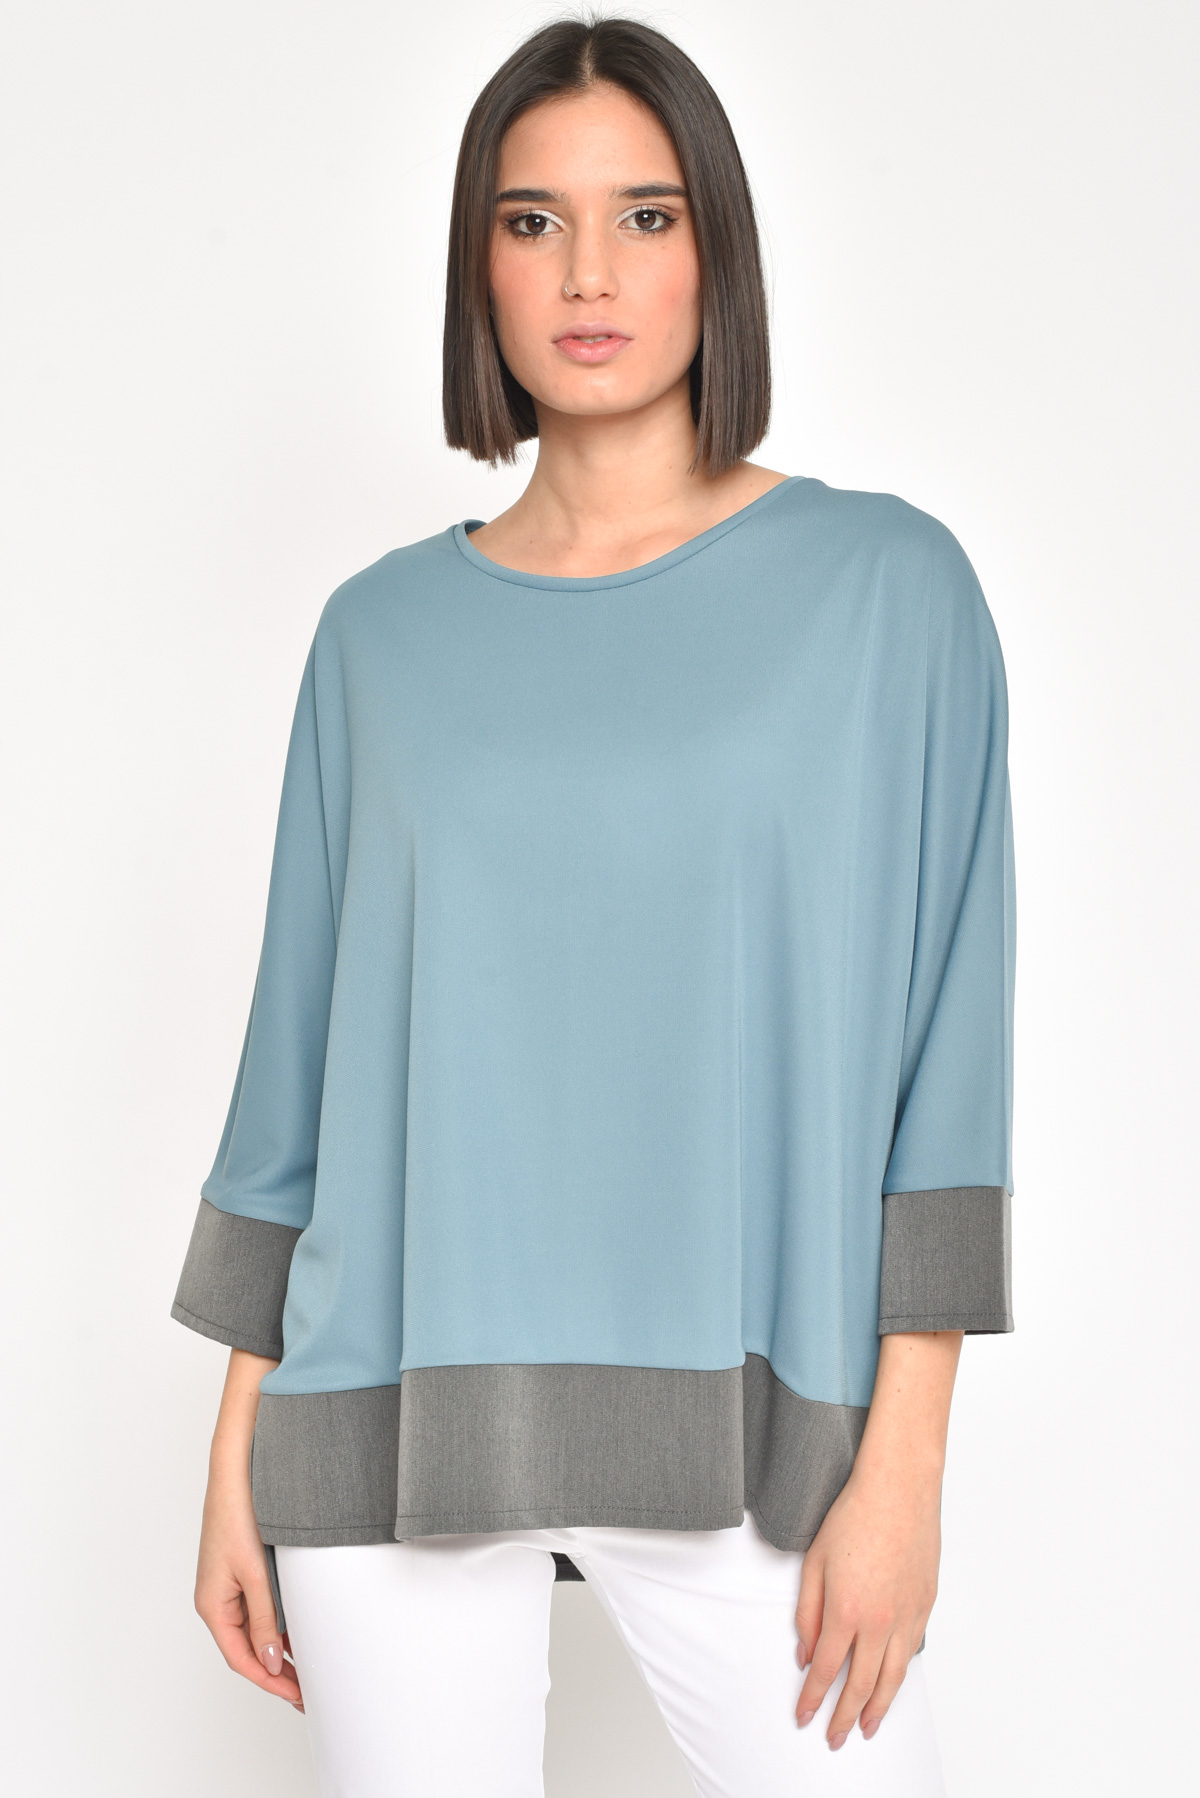 BLUSA CON PROFILI A CONTRASTO for women - PETROLEUM - Paquito Pronto Moda Shop Online